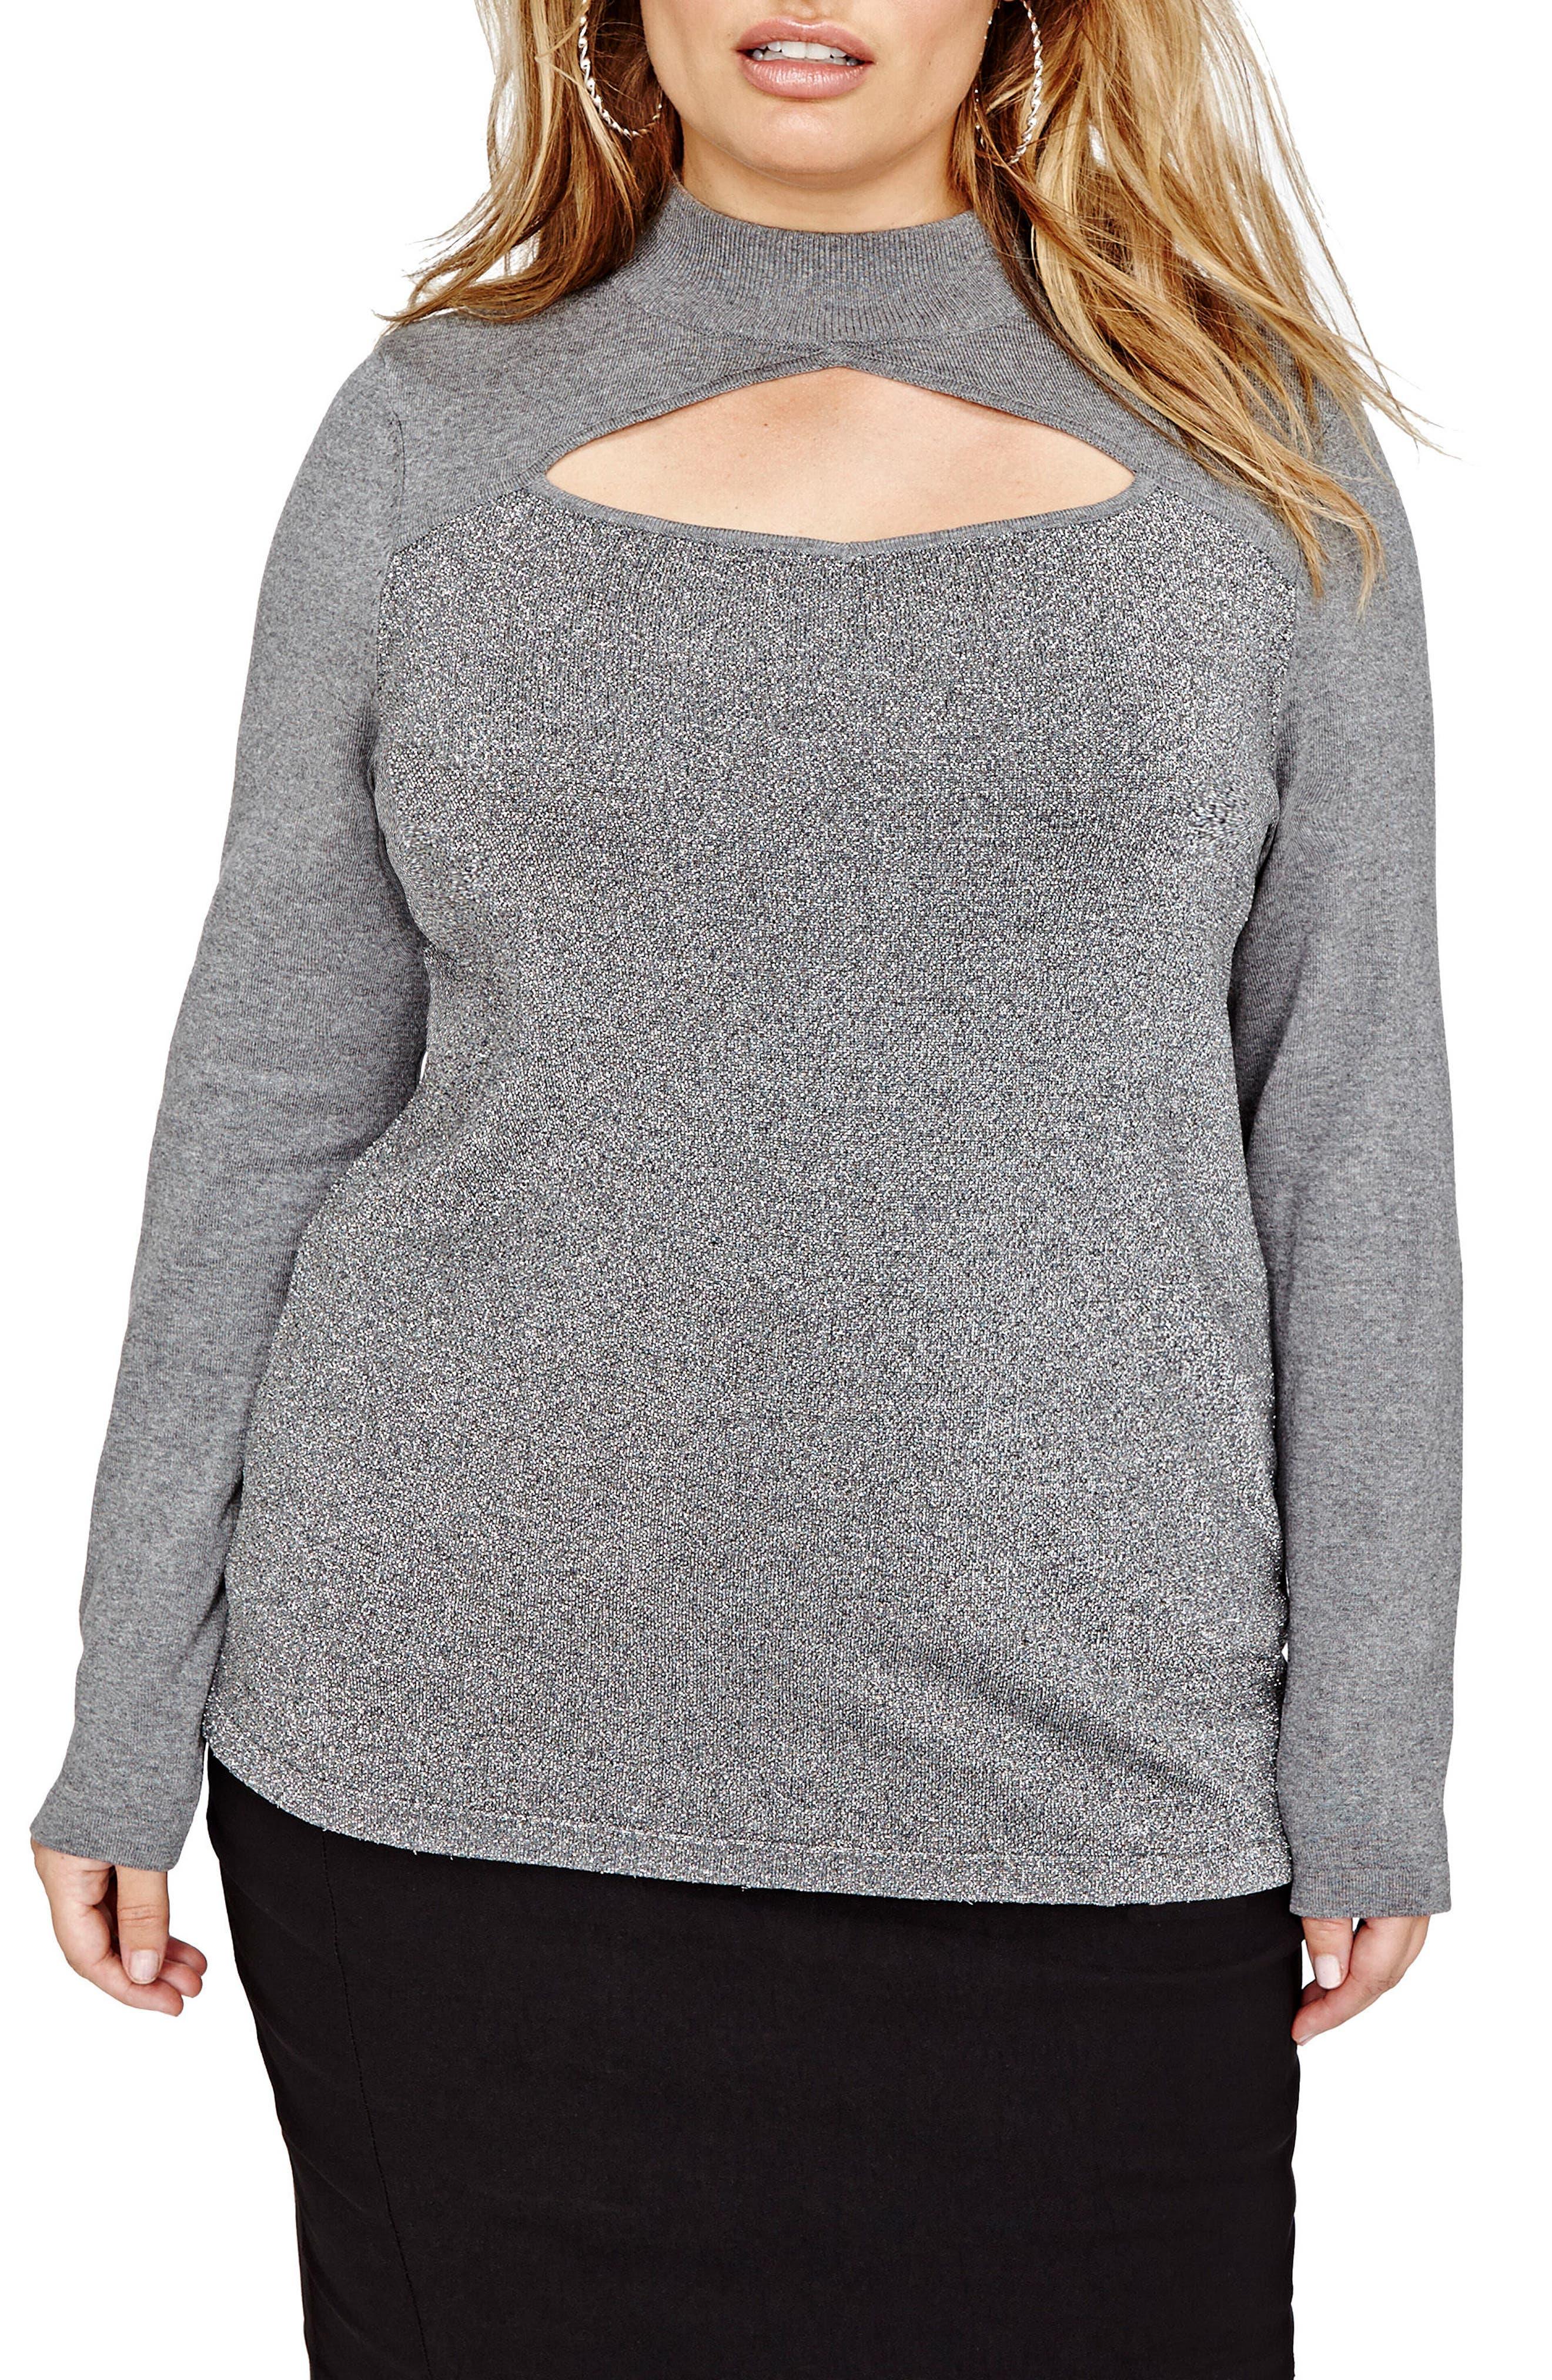 Peekaboo Cutout Sweater,                             Main thumbnail 1, color,                             950